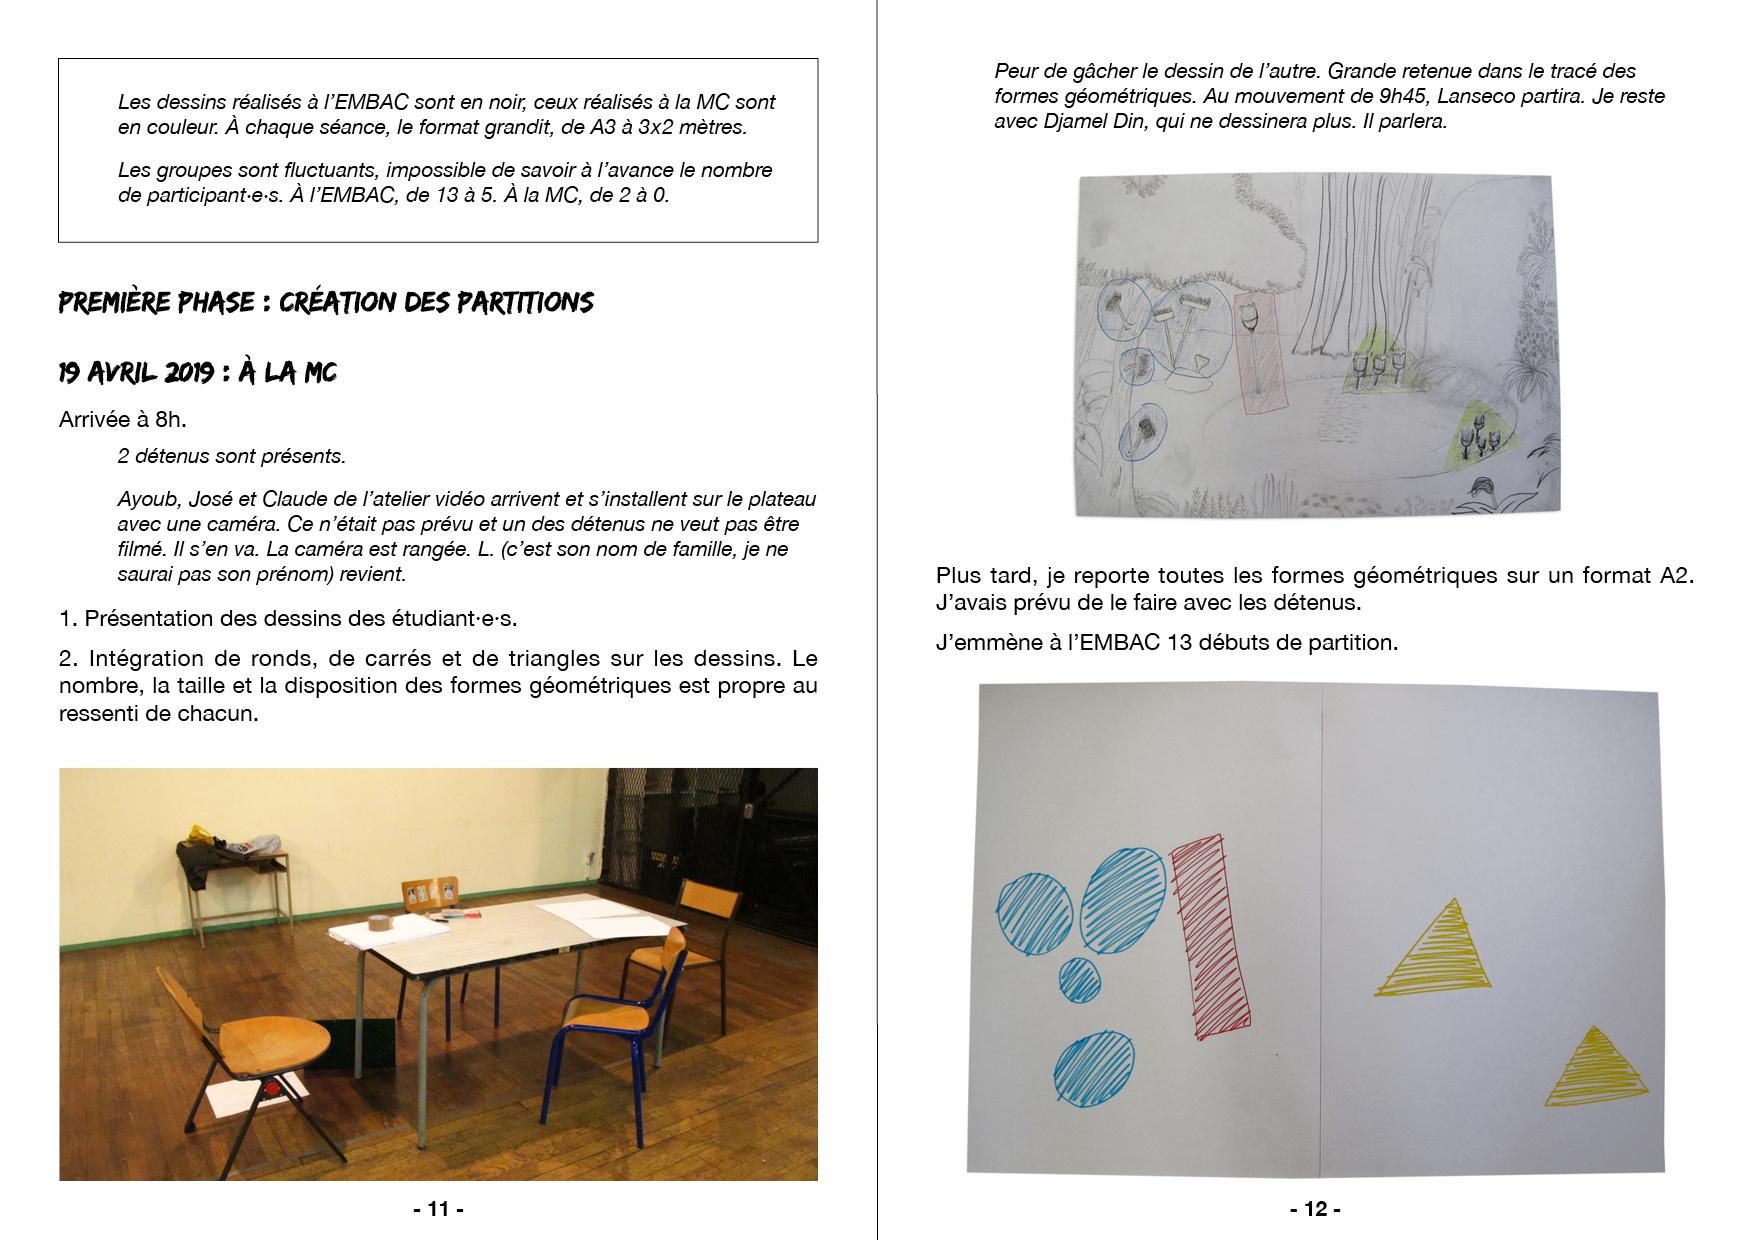 CEPIA2_projet-EnCorps_BrunoMichellod7